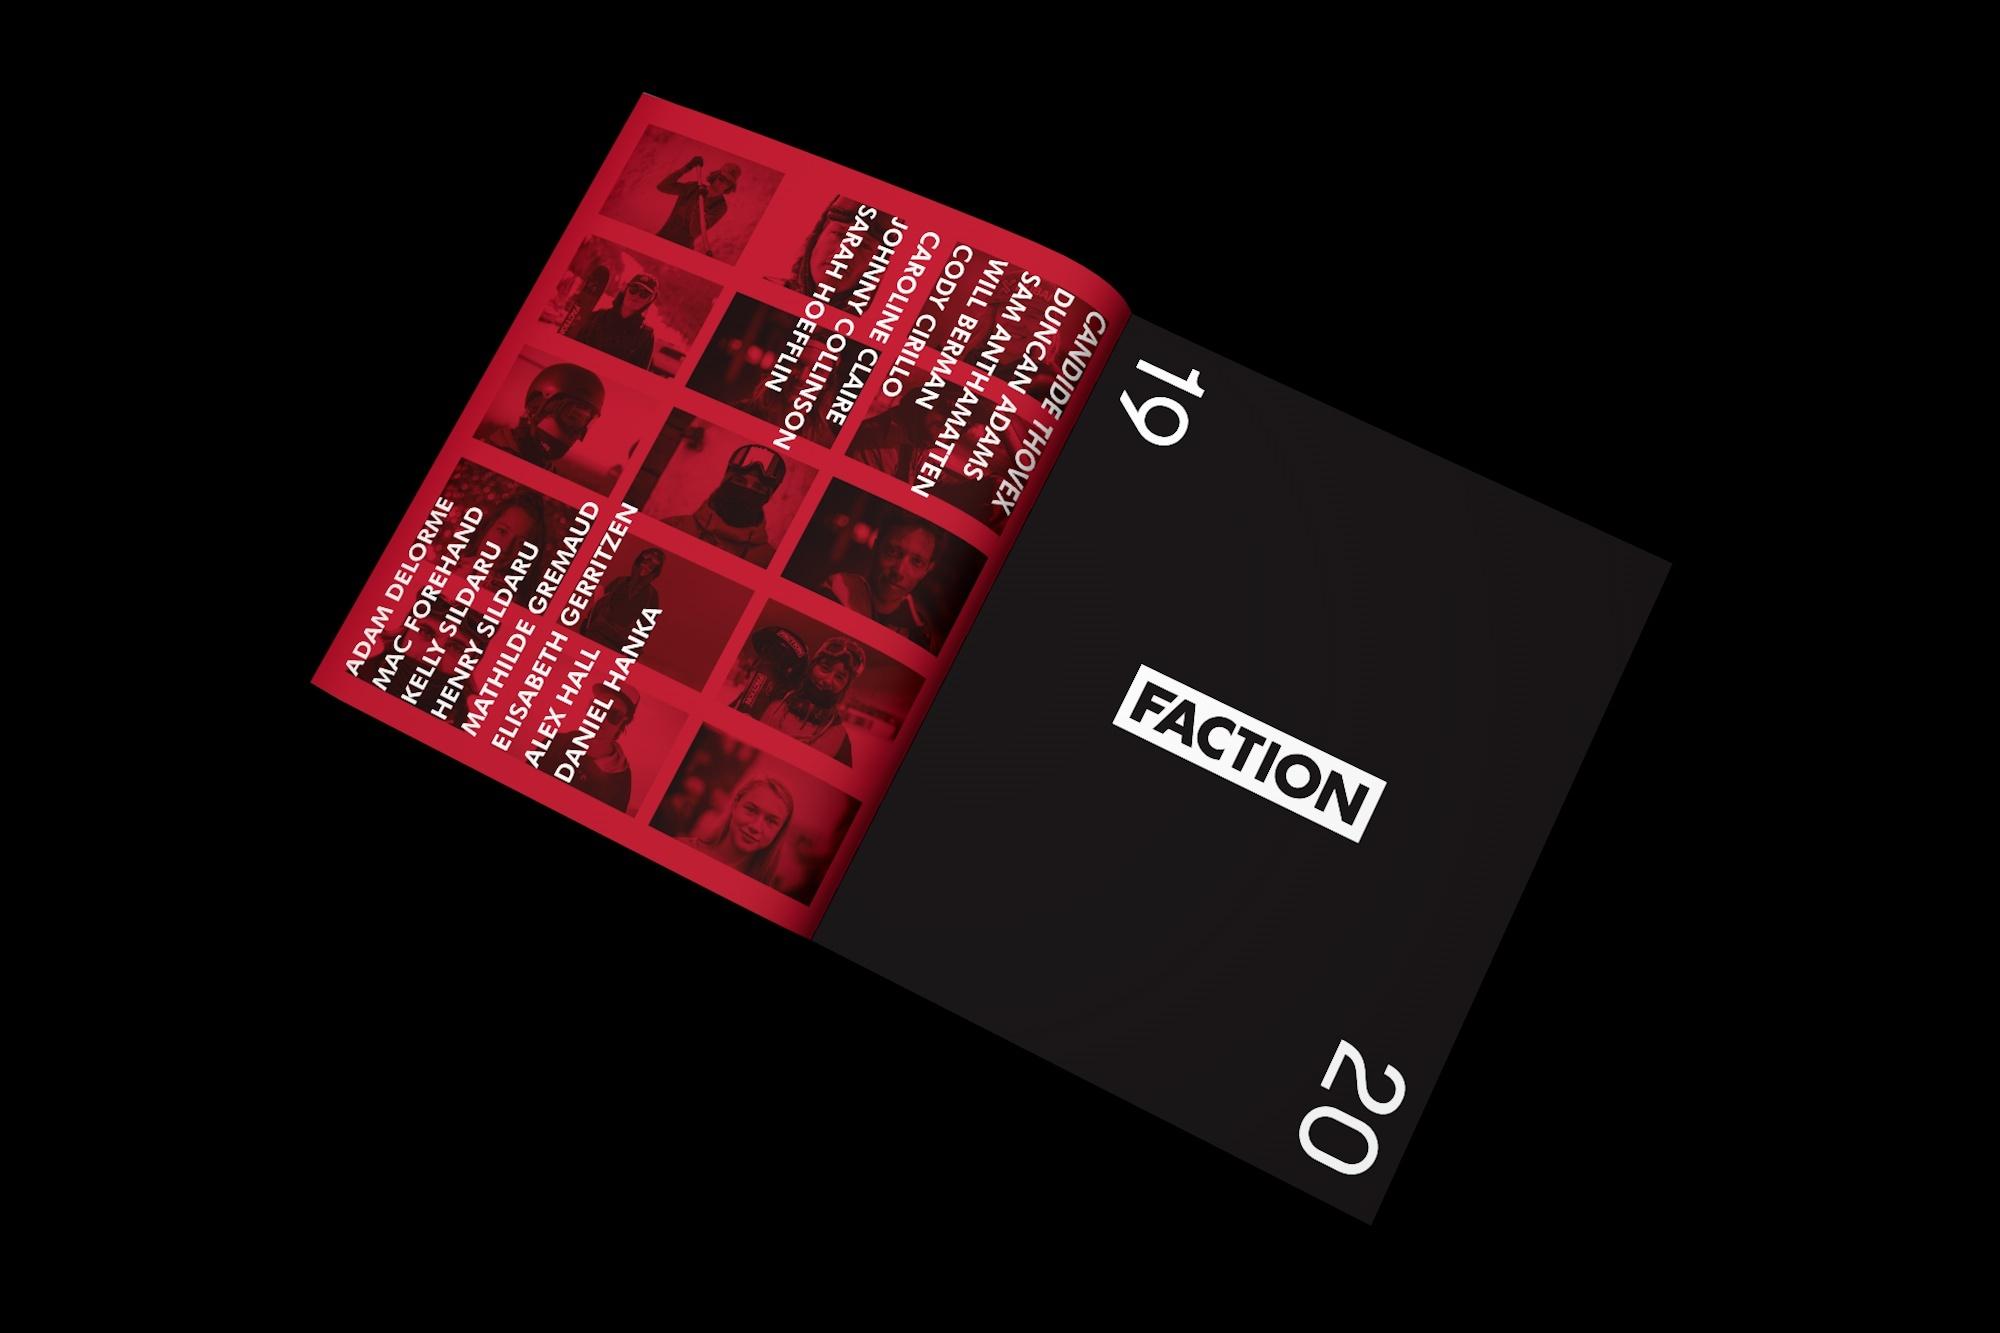 MASTER CS FACTION Catalogue Inside Colour